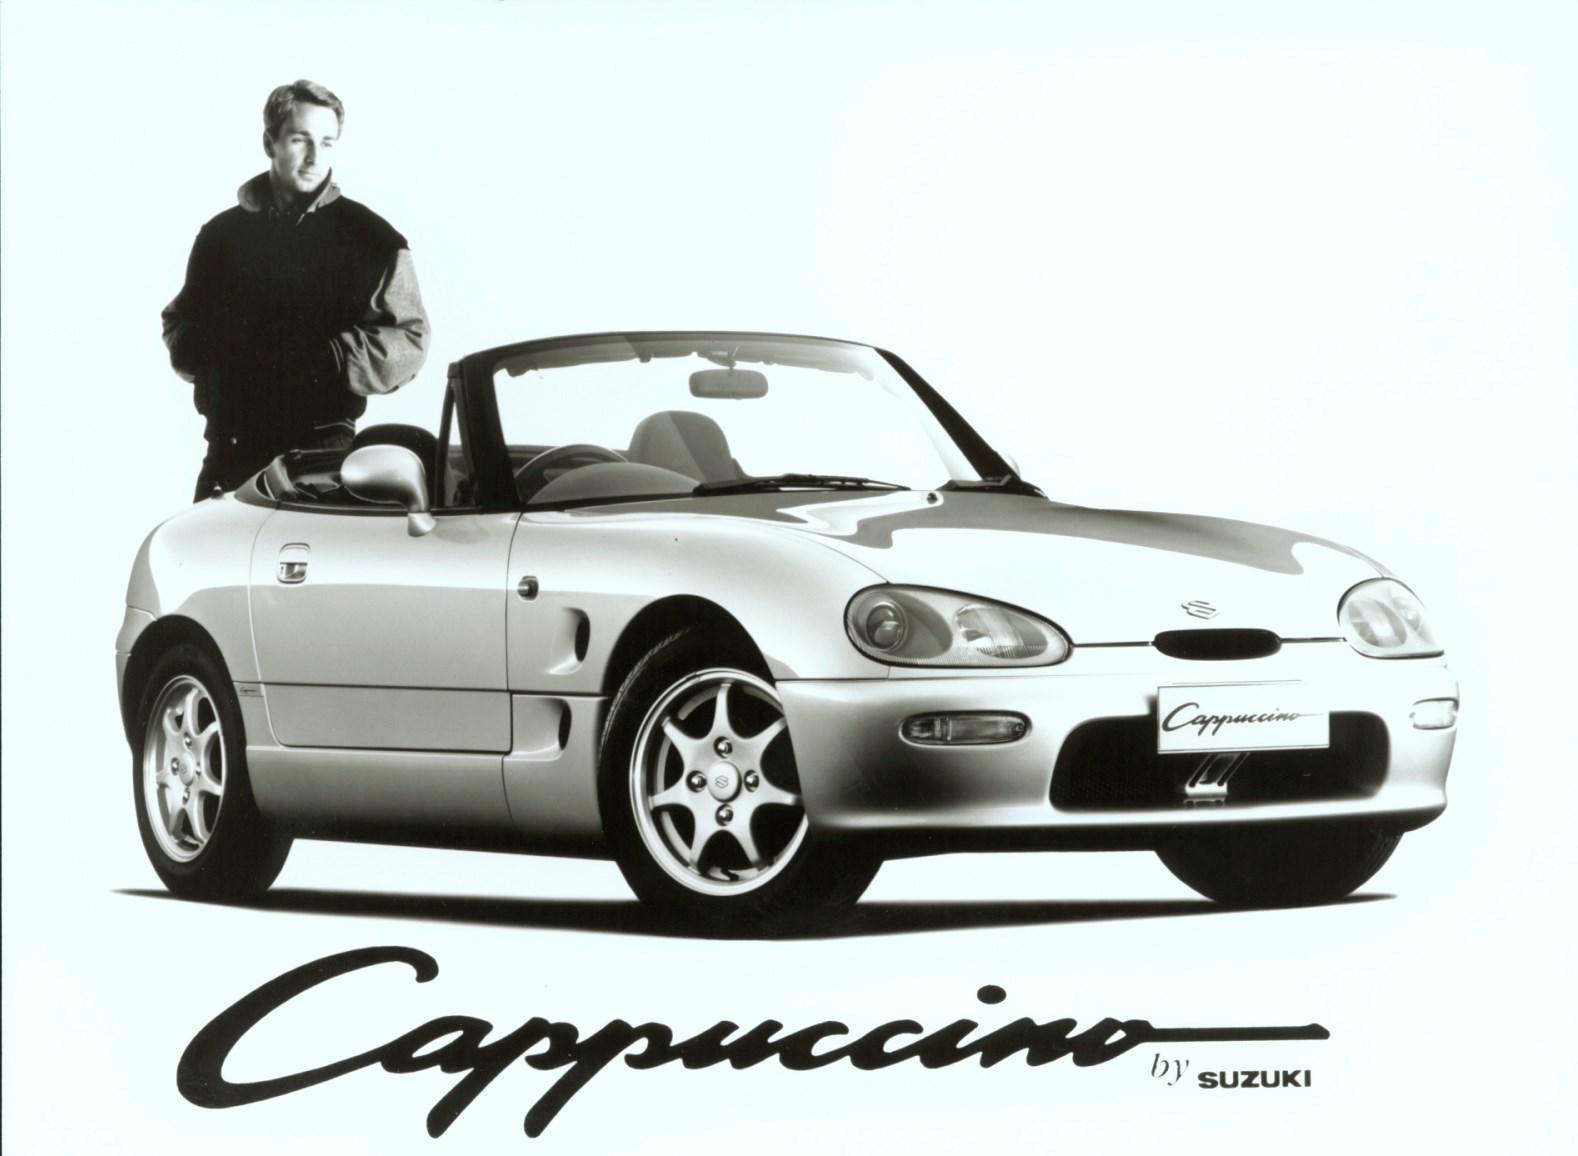 suzuki cappuccino convertible review 1993 1996 parkers